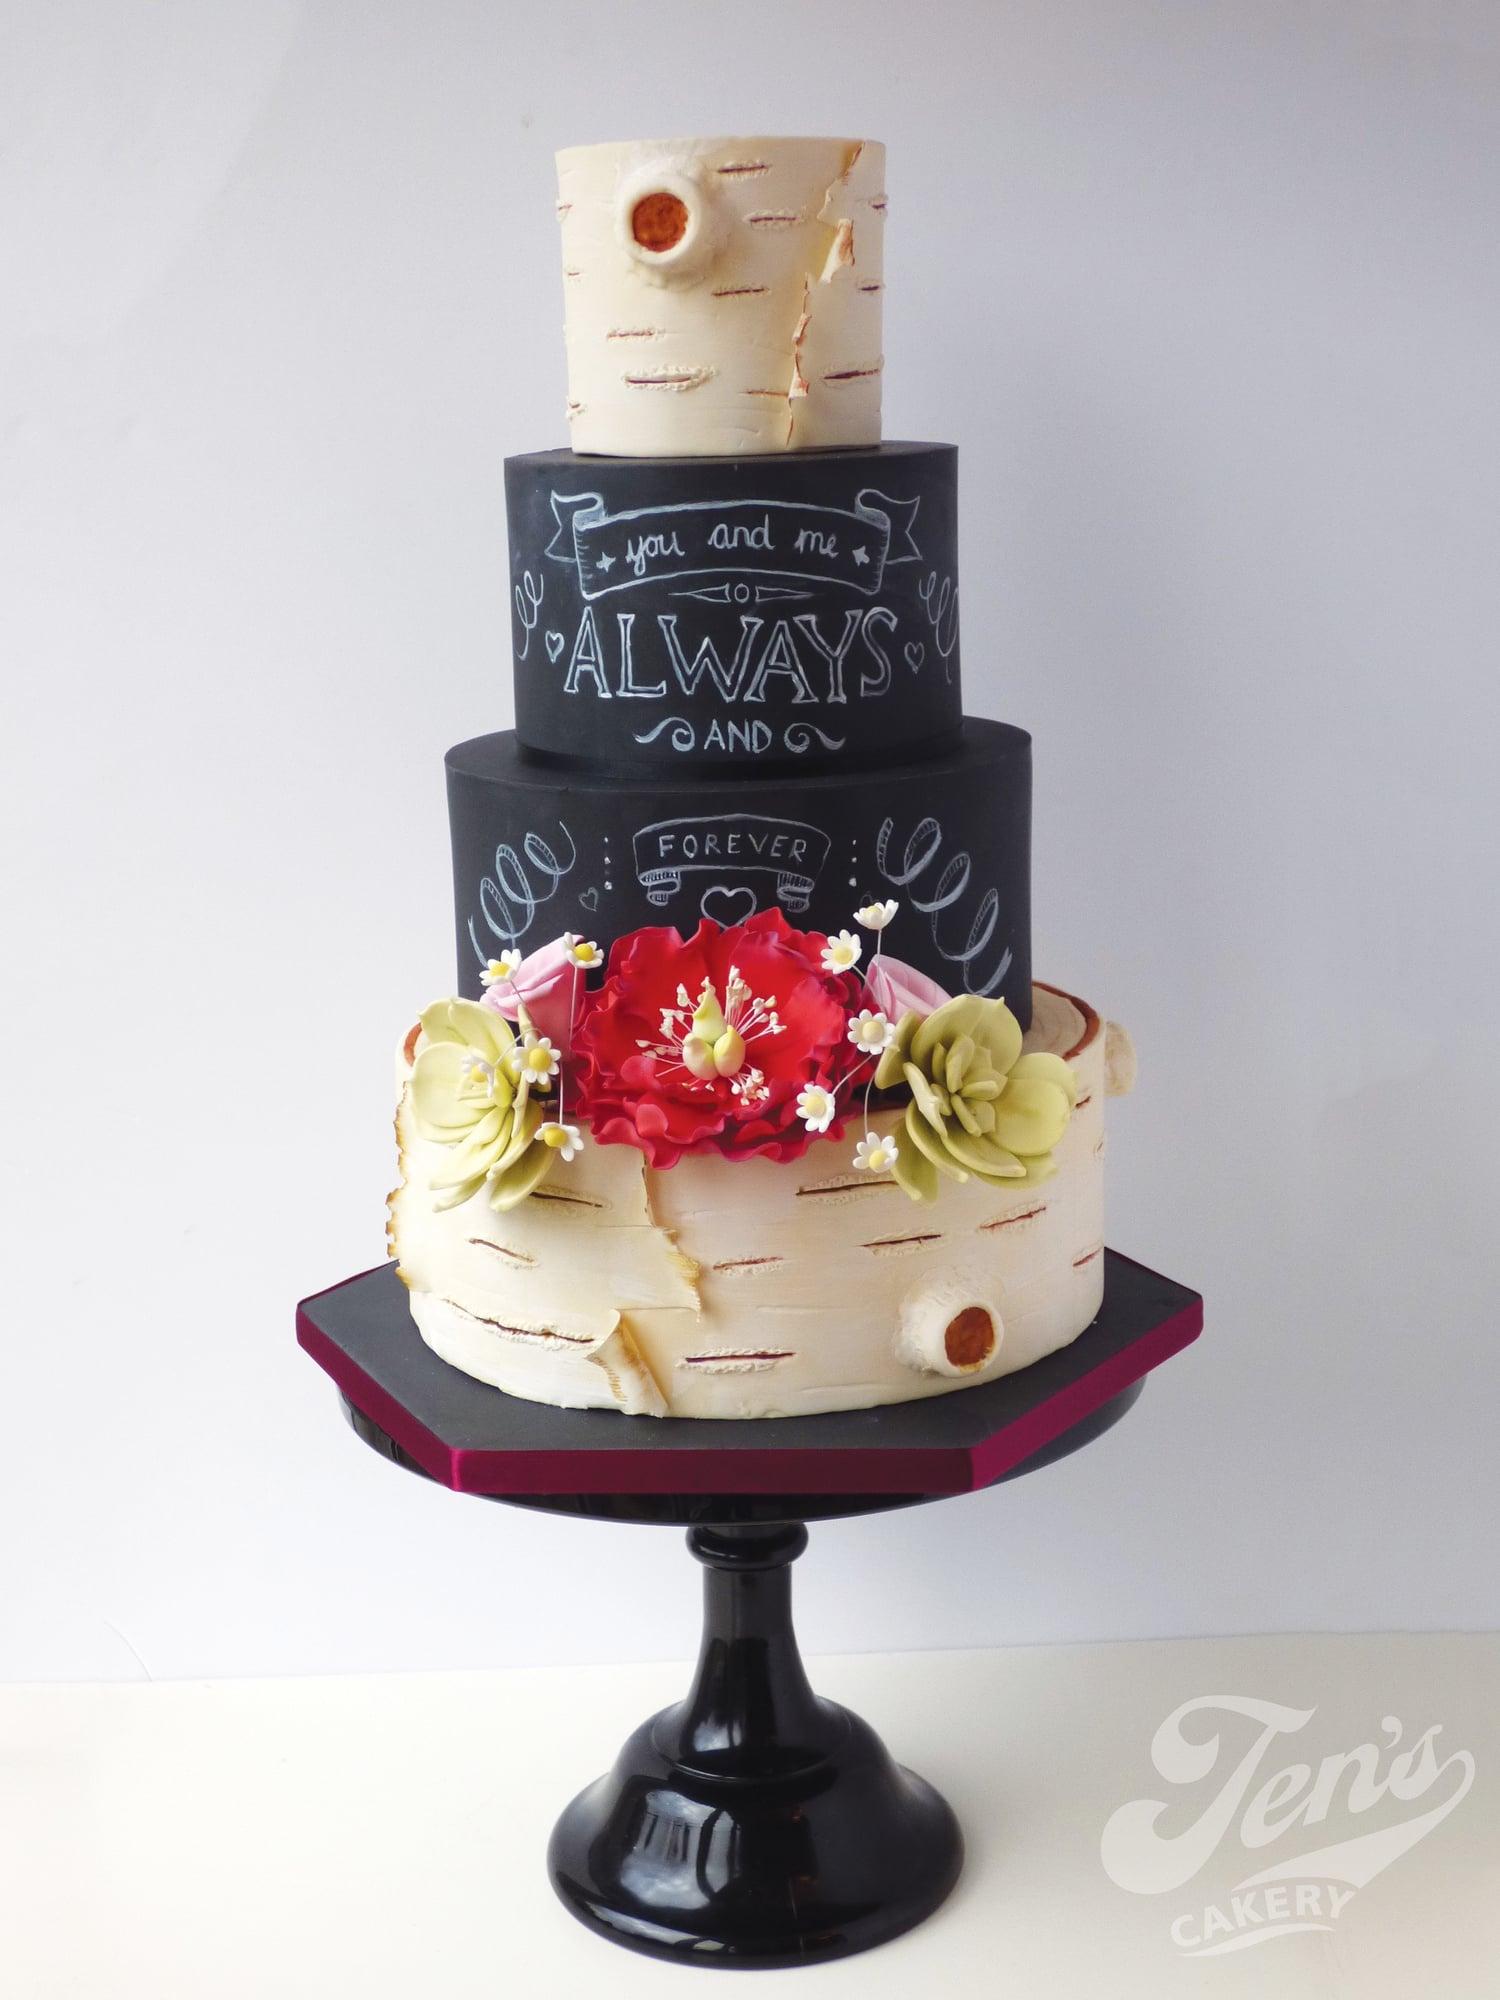 Wedding cake with silver birch tree bark and slate chalkboard art.